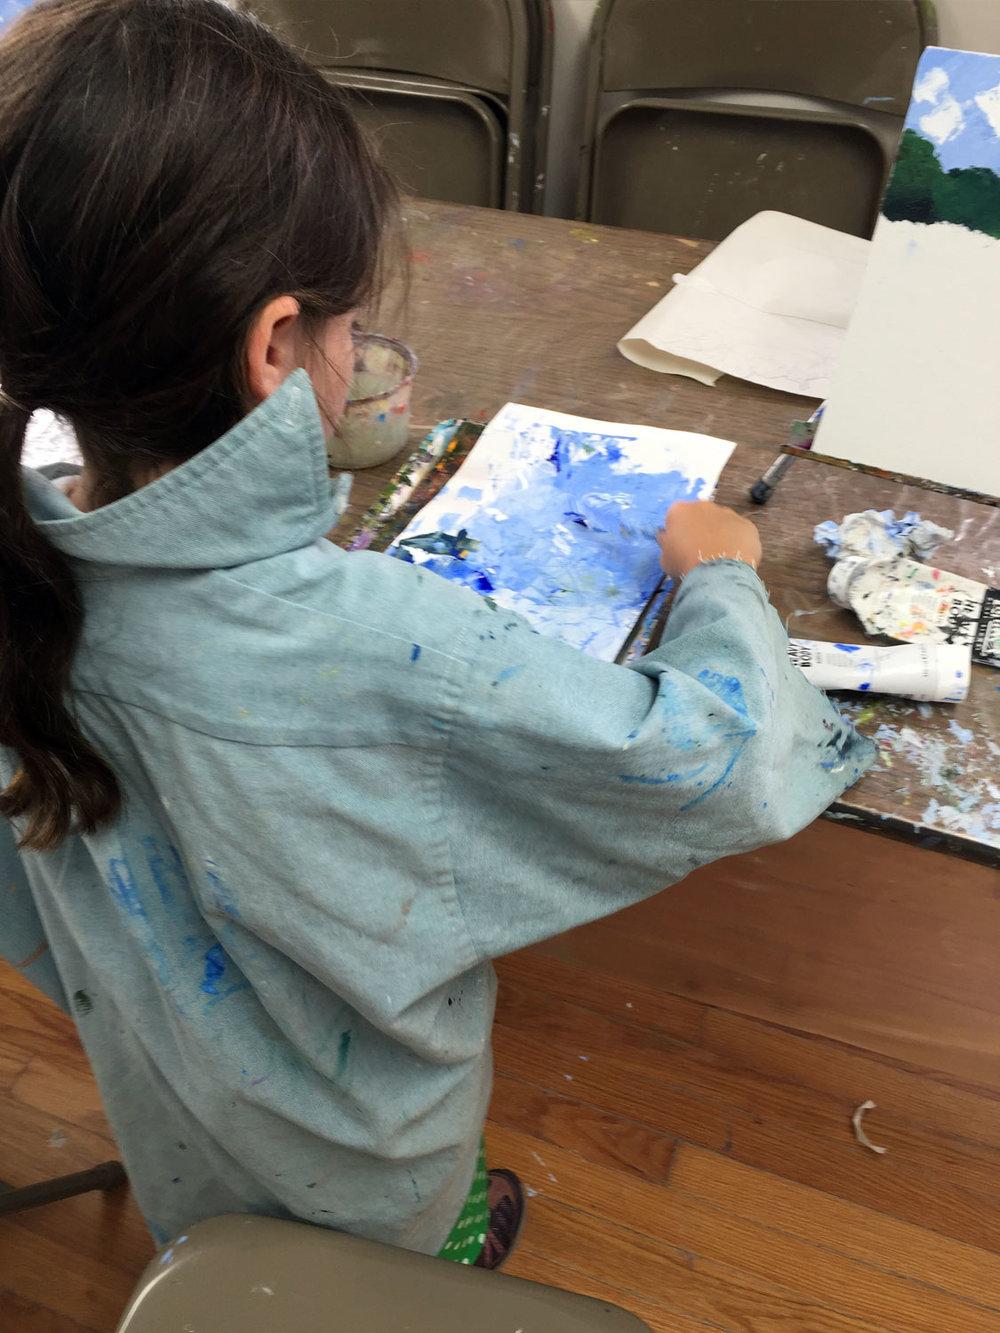 Child_painting.jpg